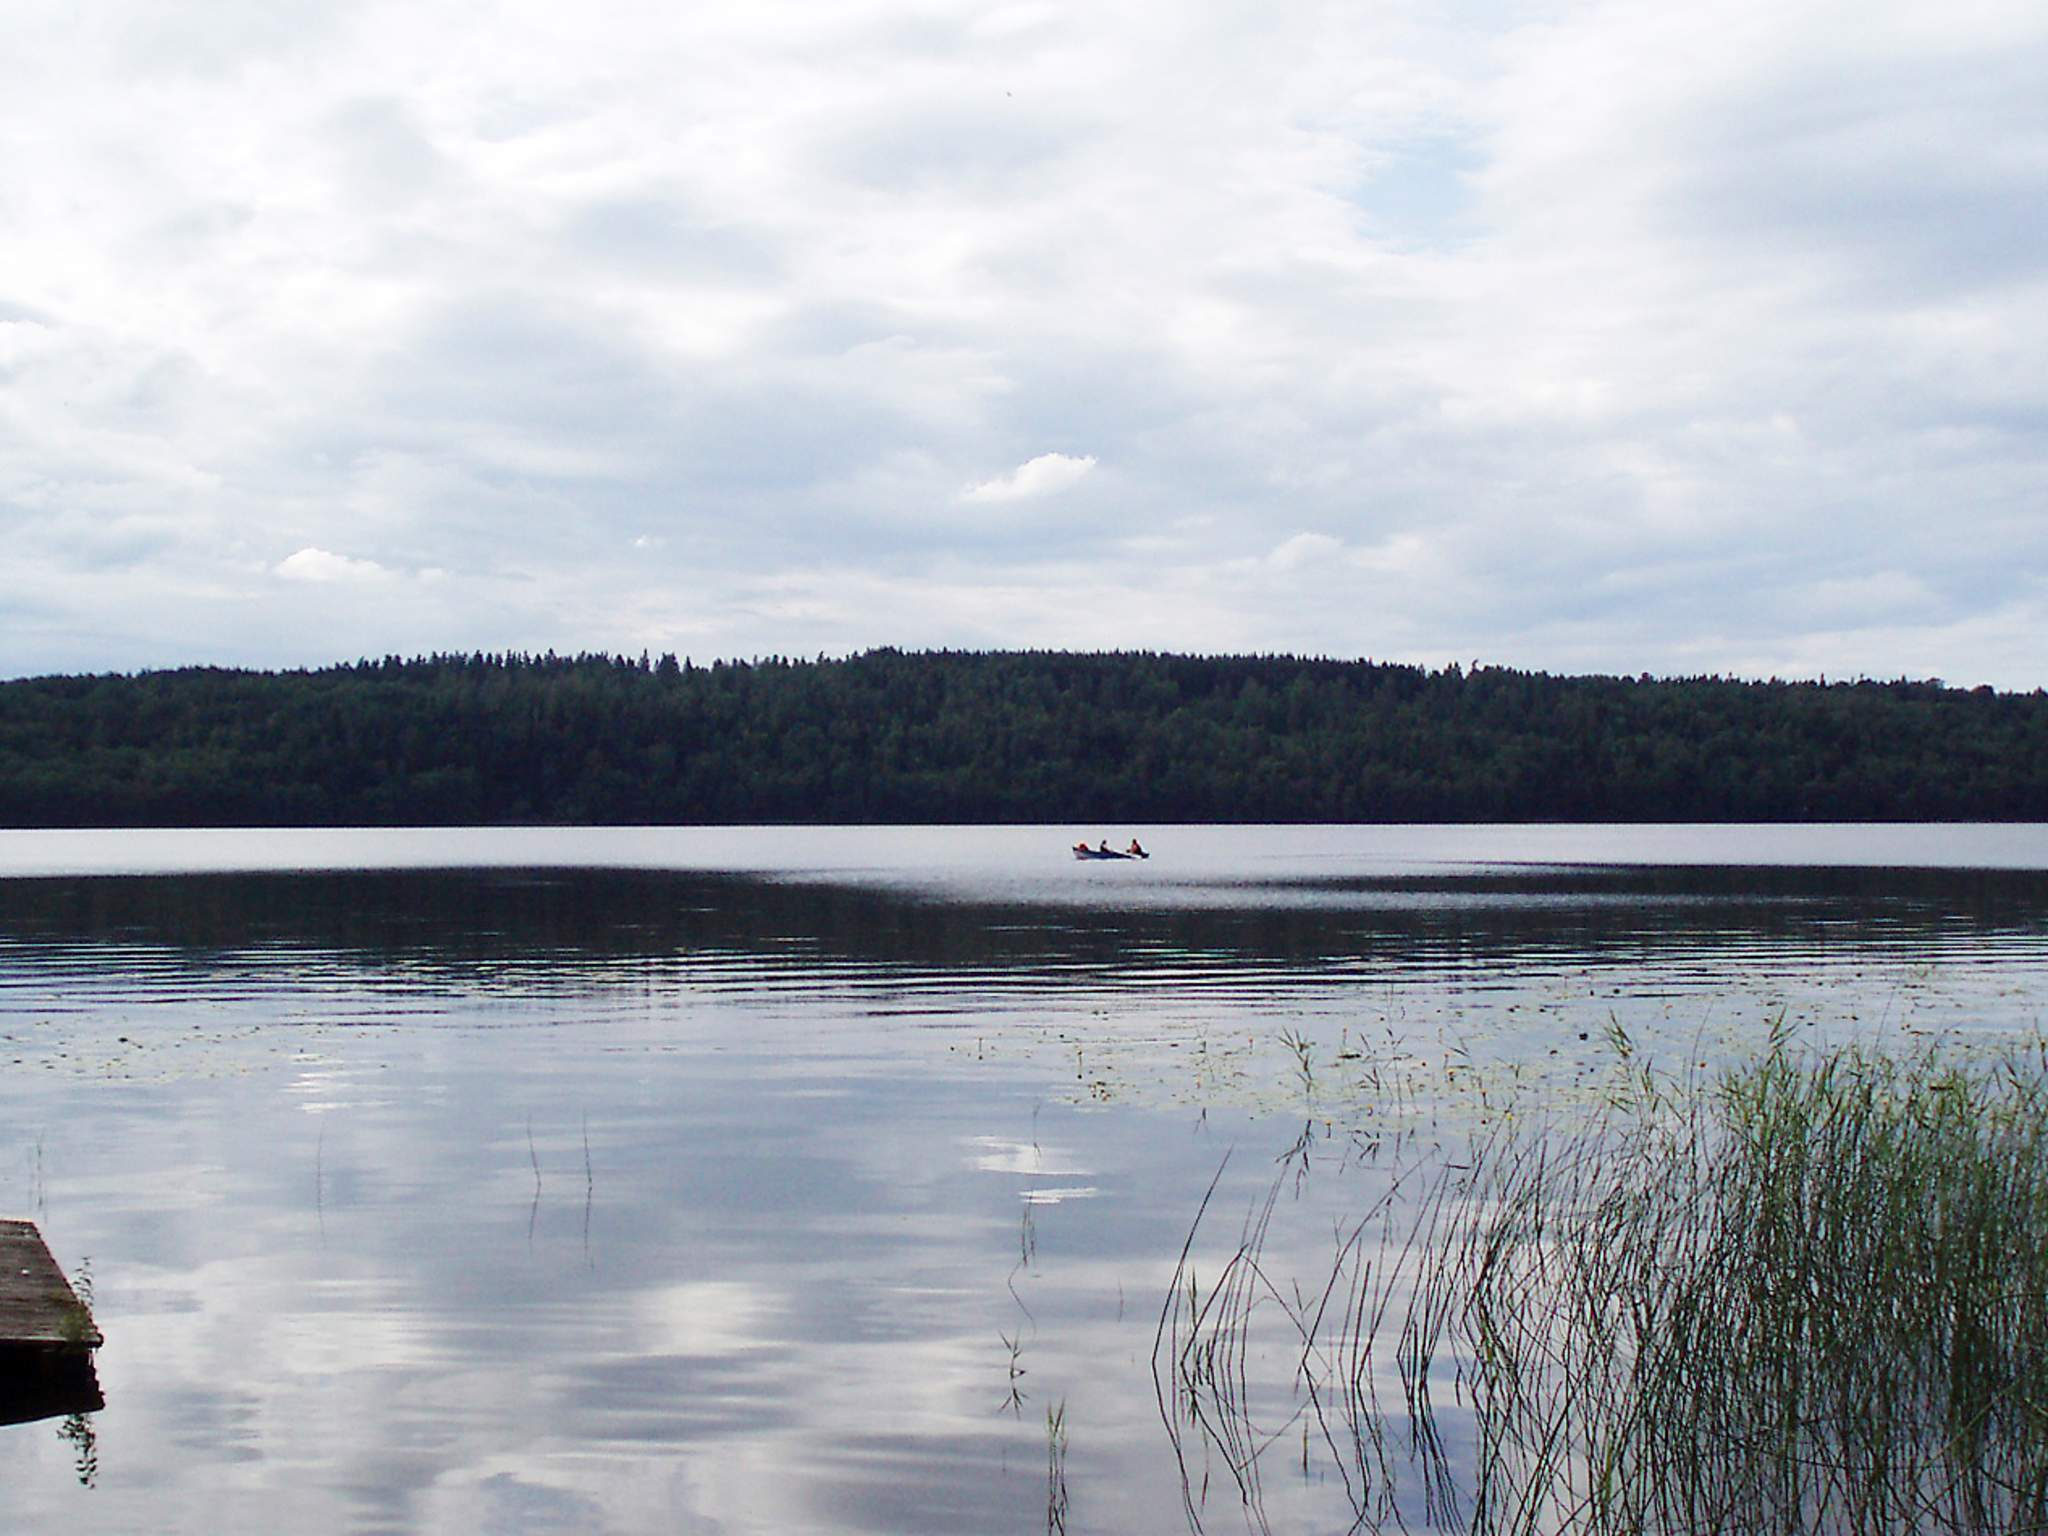 Ferienhaus Melldala (82042), Lerdala, Västra Götaland län, Westschweden, Schweden, Bild 14